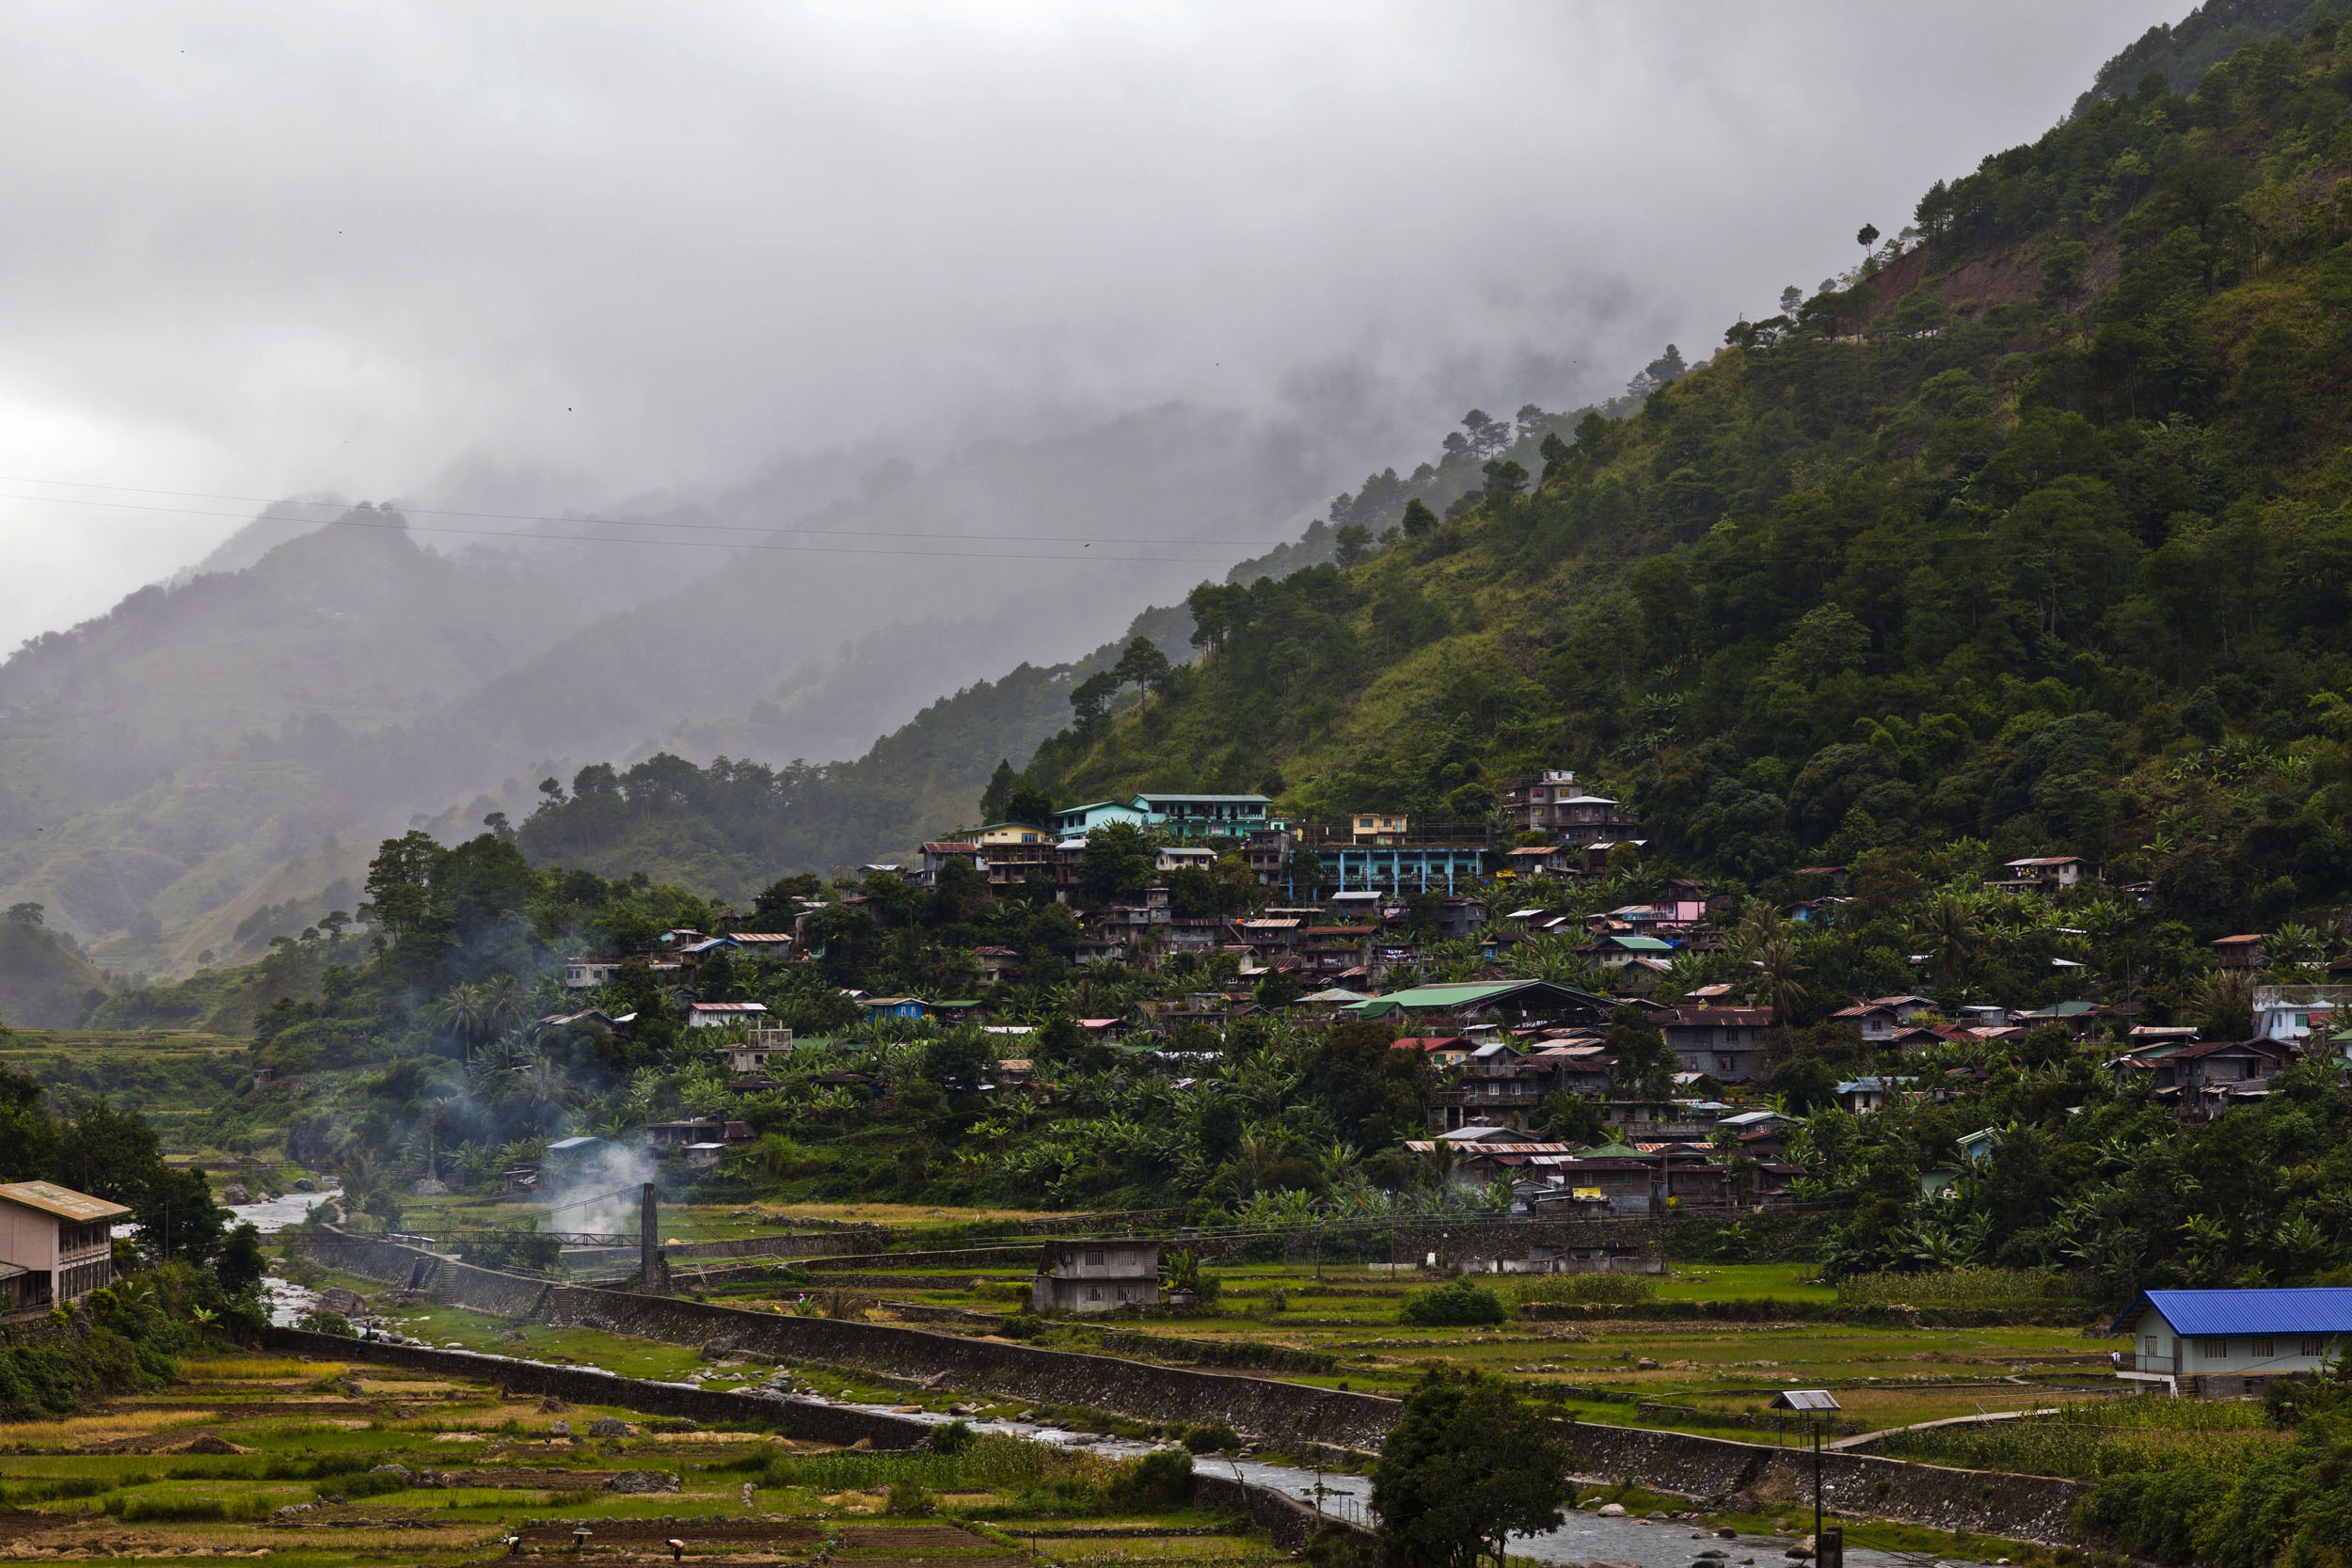 Local towns and villages along the Kabayan Rd Halsema Highway from Baguio to Sagada Aug 2011 13